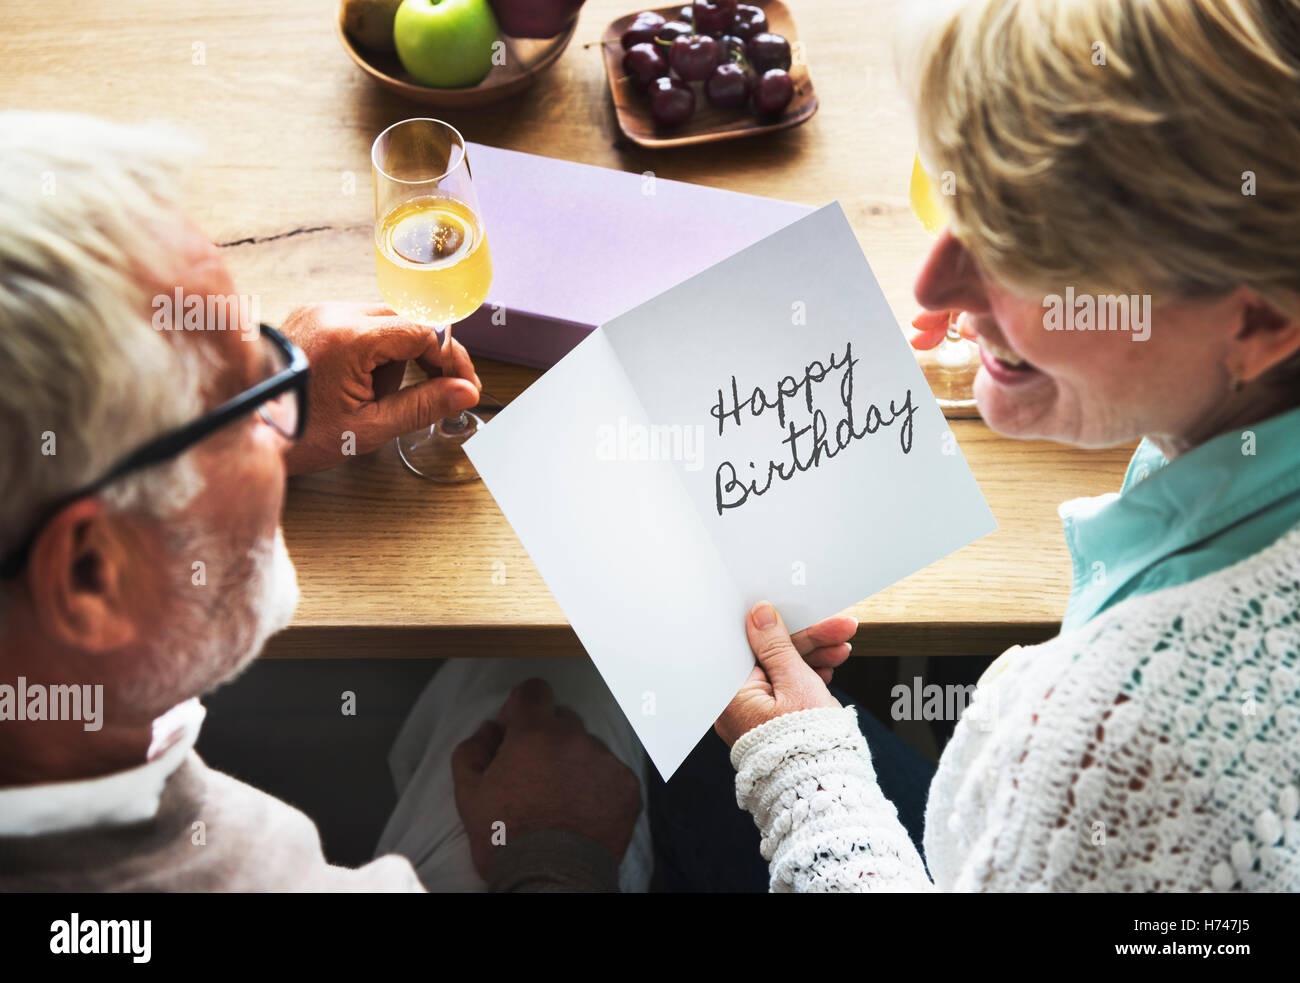 HBD Happy Birthday Celebration Congratulation Party Concept - Stock Image